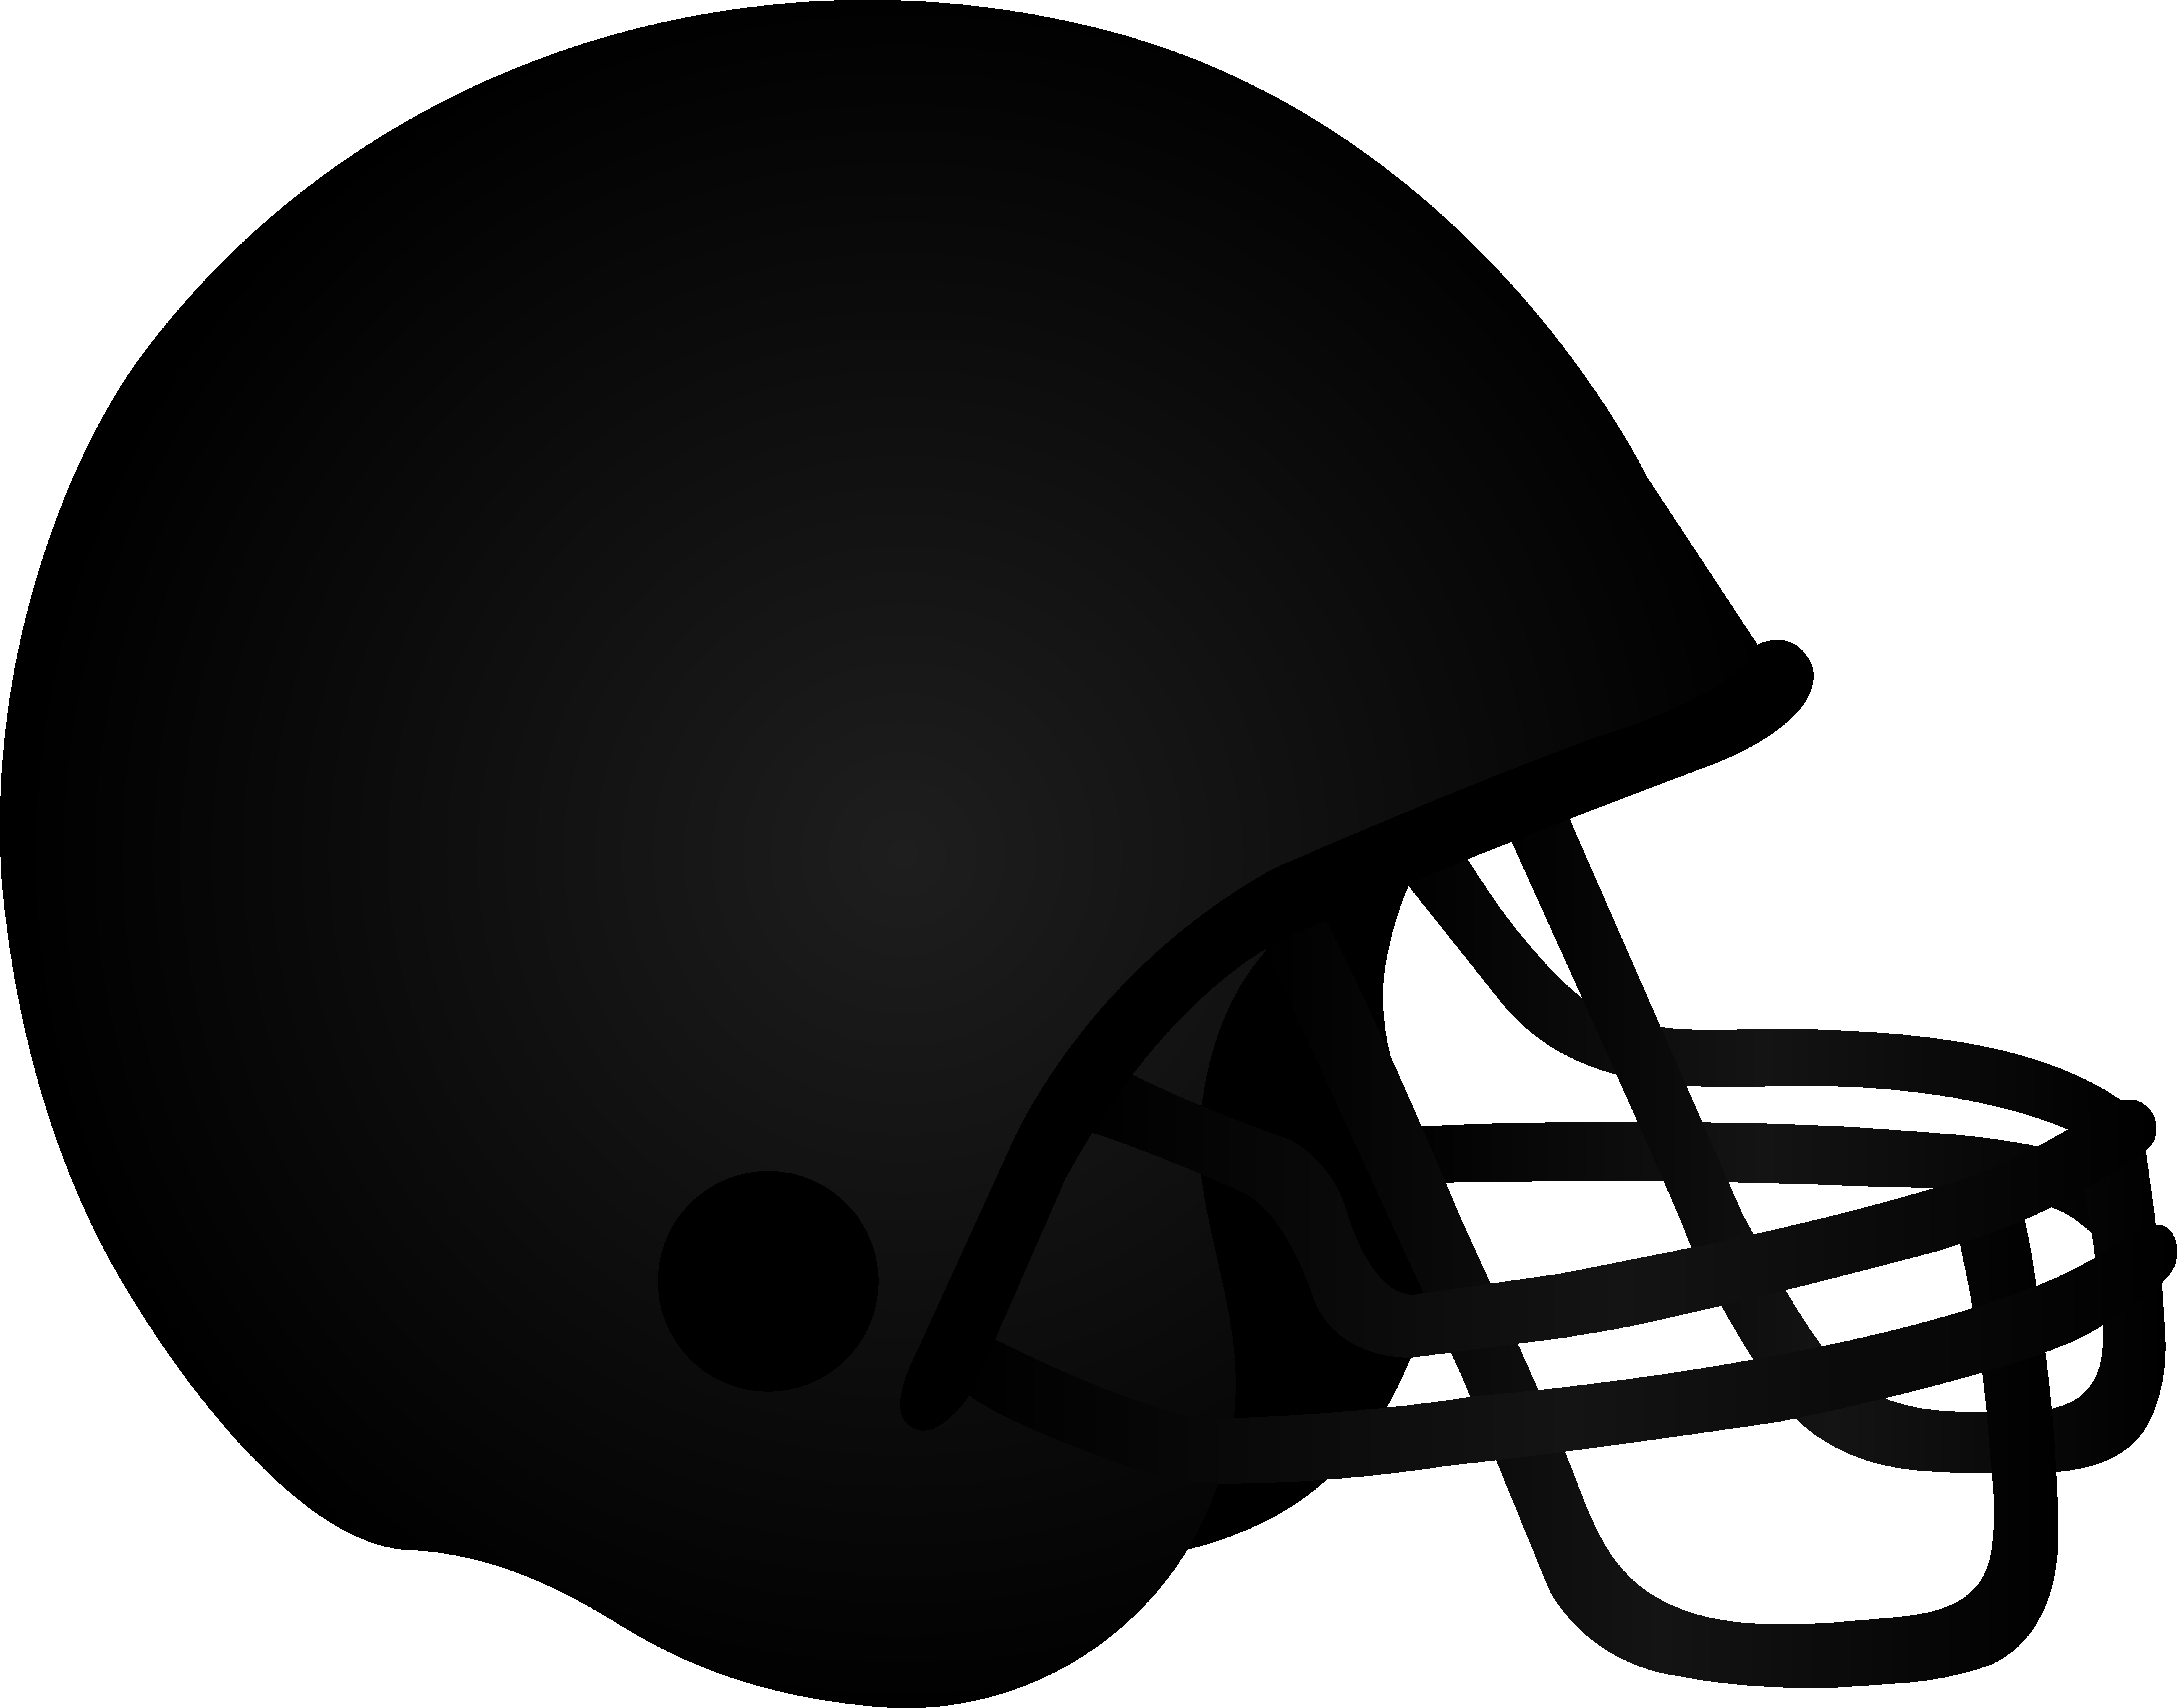 football helmet silhouette vector at getdrawings com free for rh getdrawings com